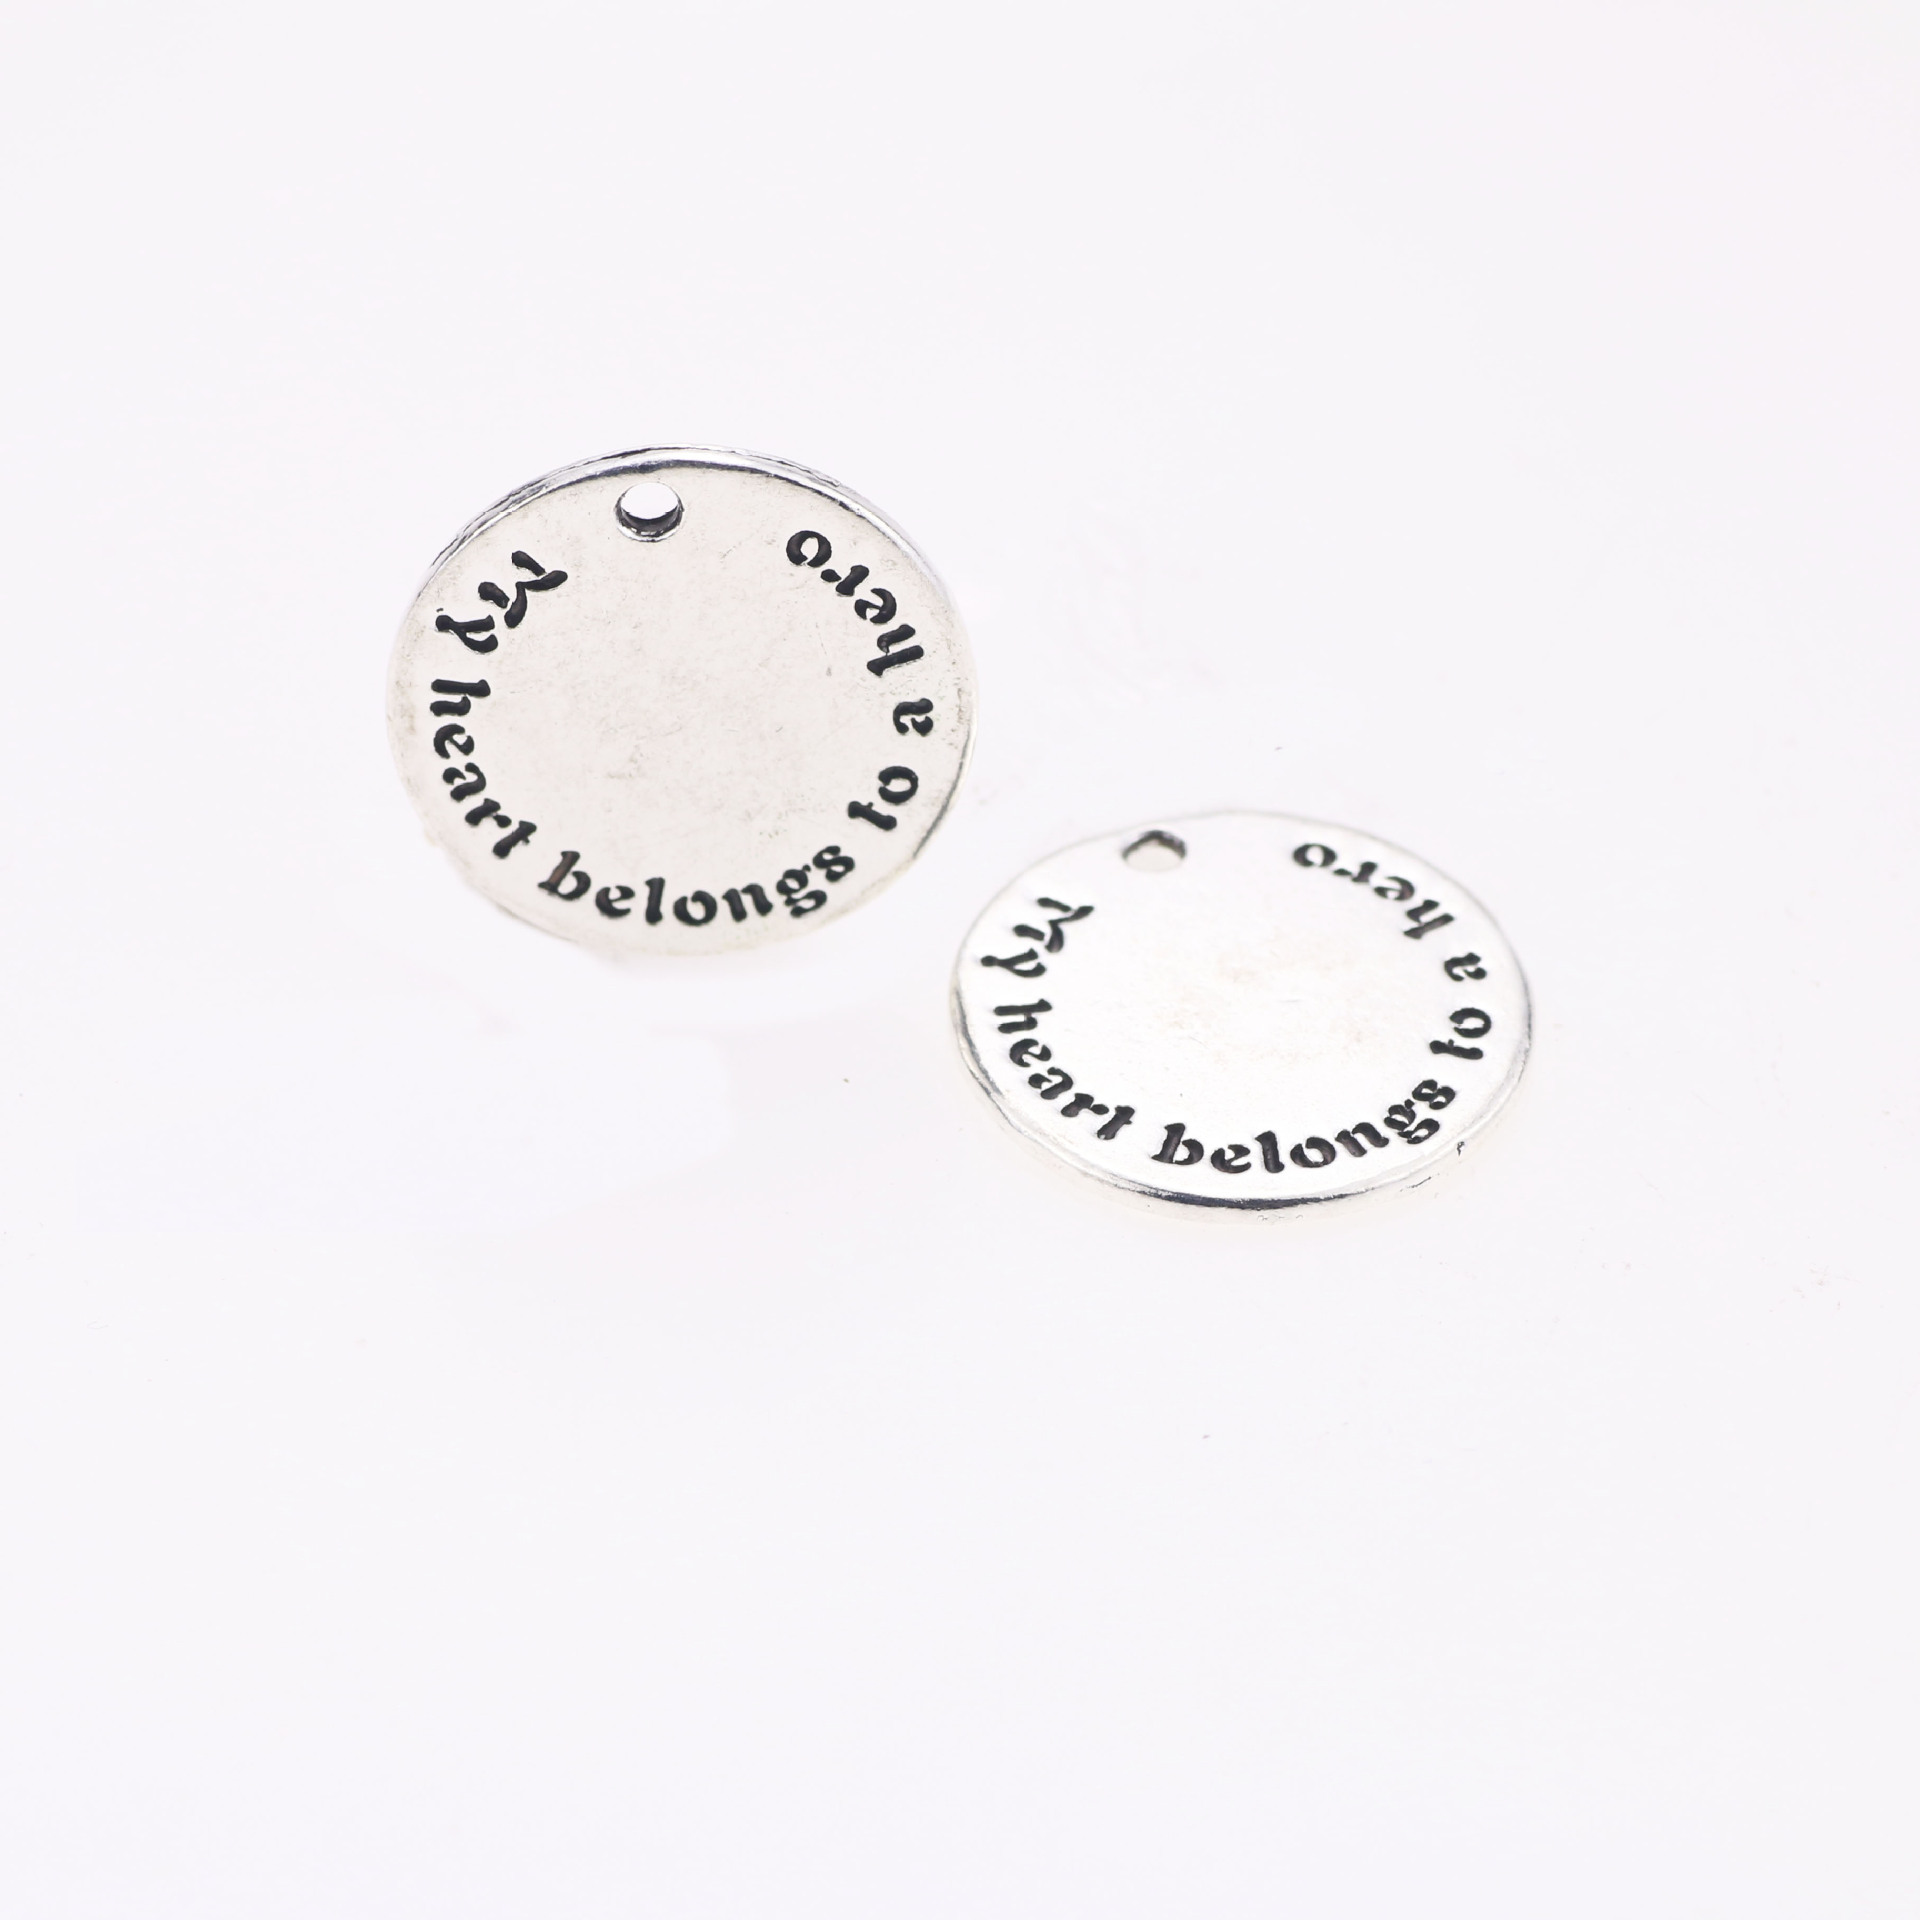 10PCs Silver Tone English Words Round Zinc Alloy Pendant Jewelry 23mm